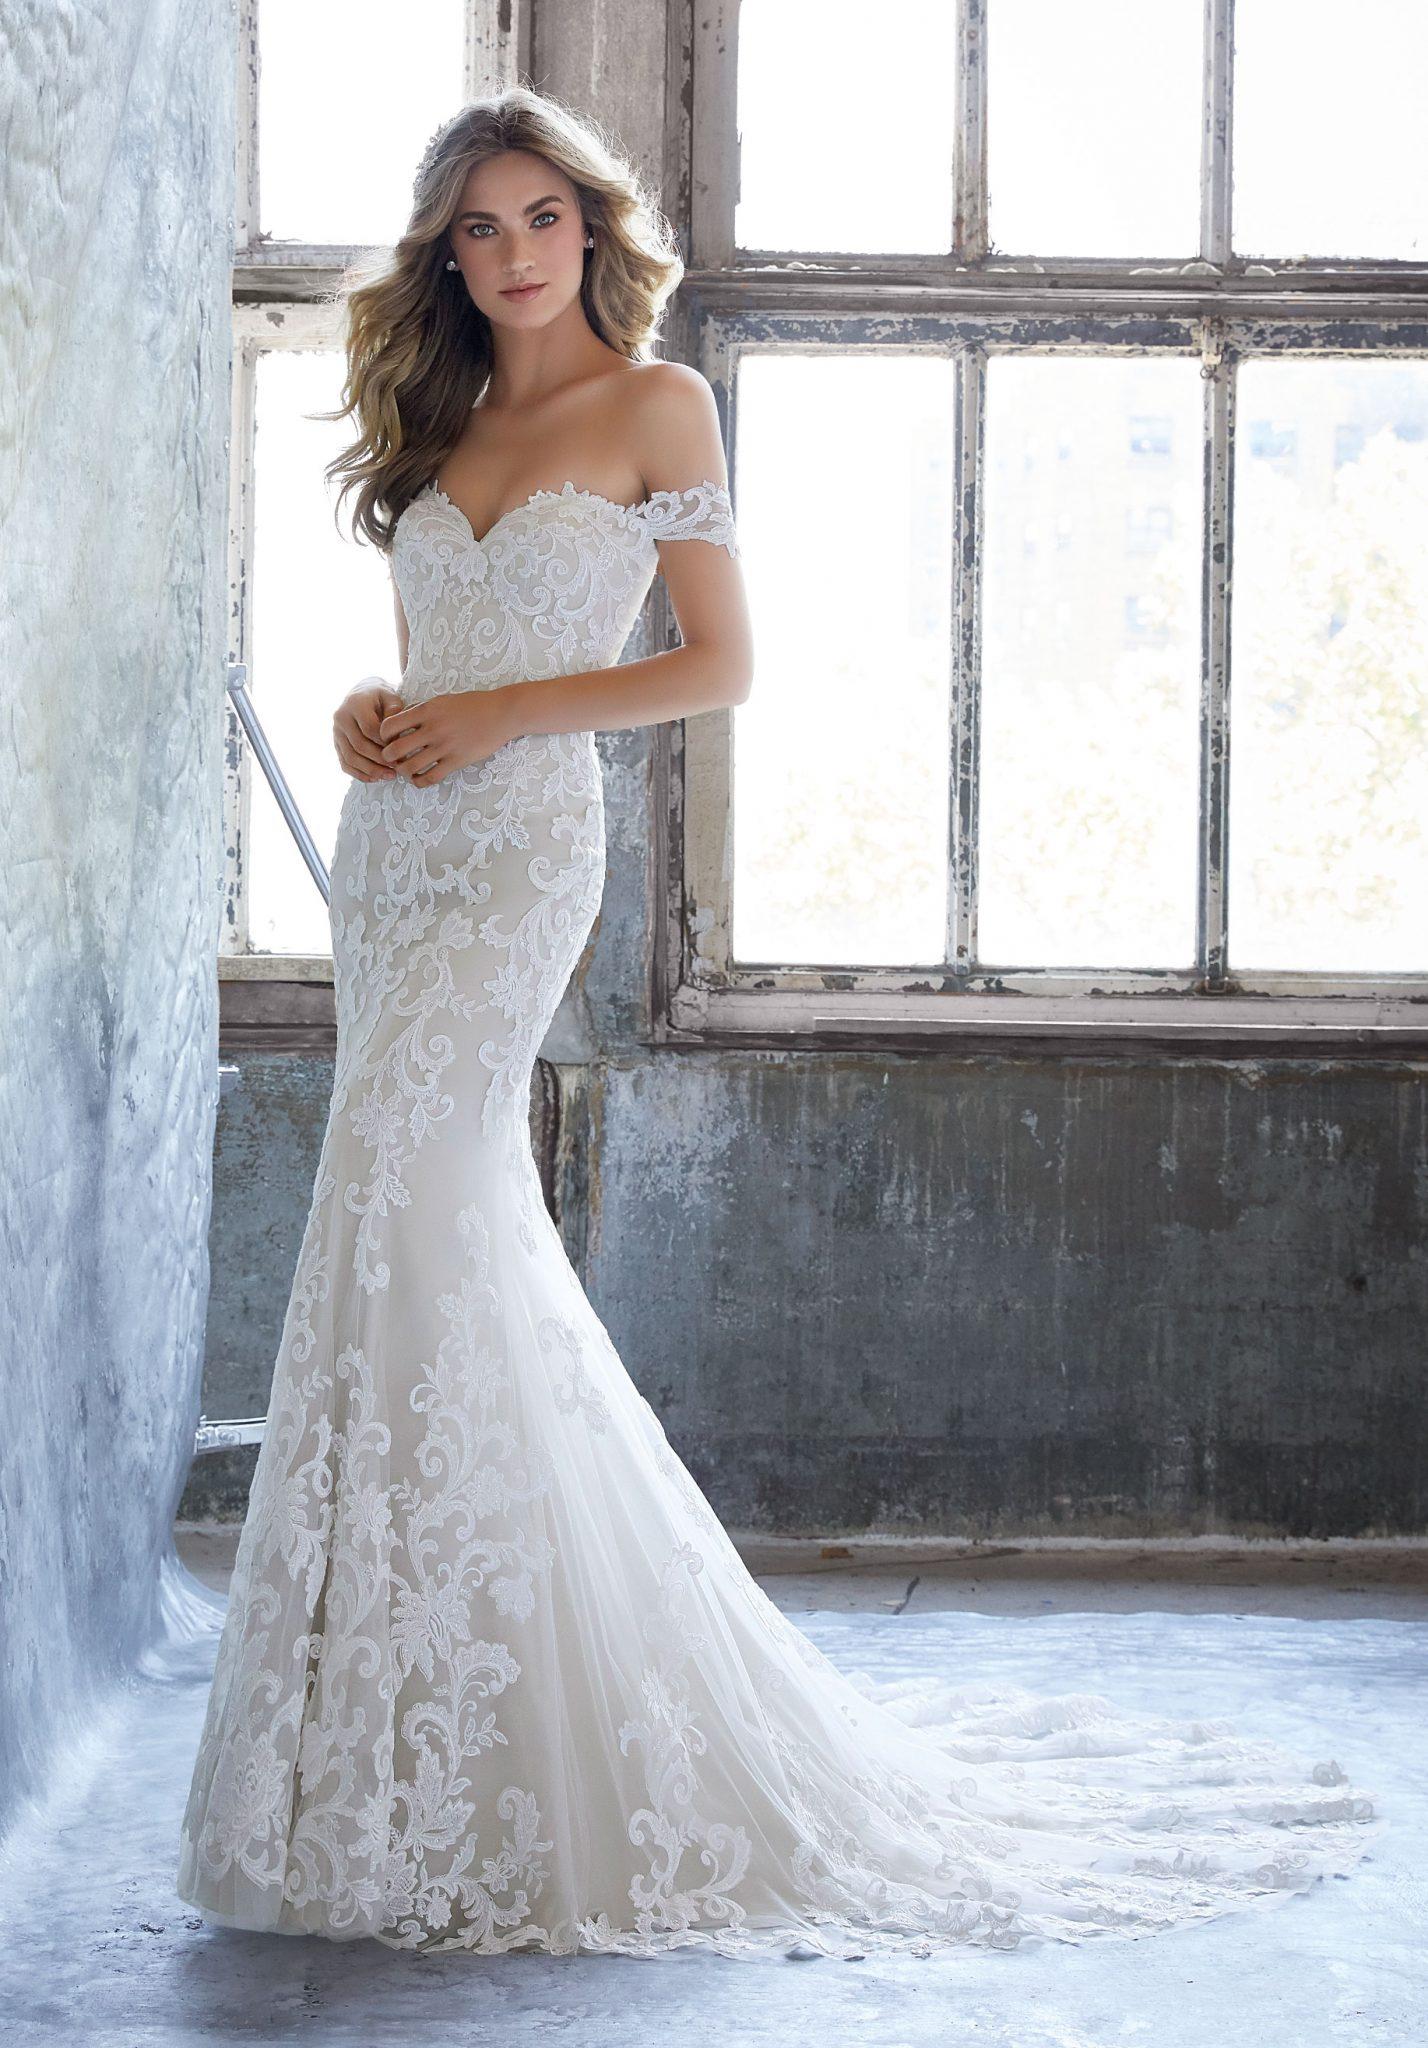 Awesome Perfect Wedding Dress